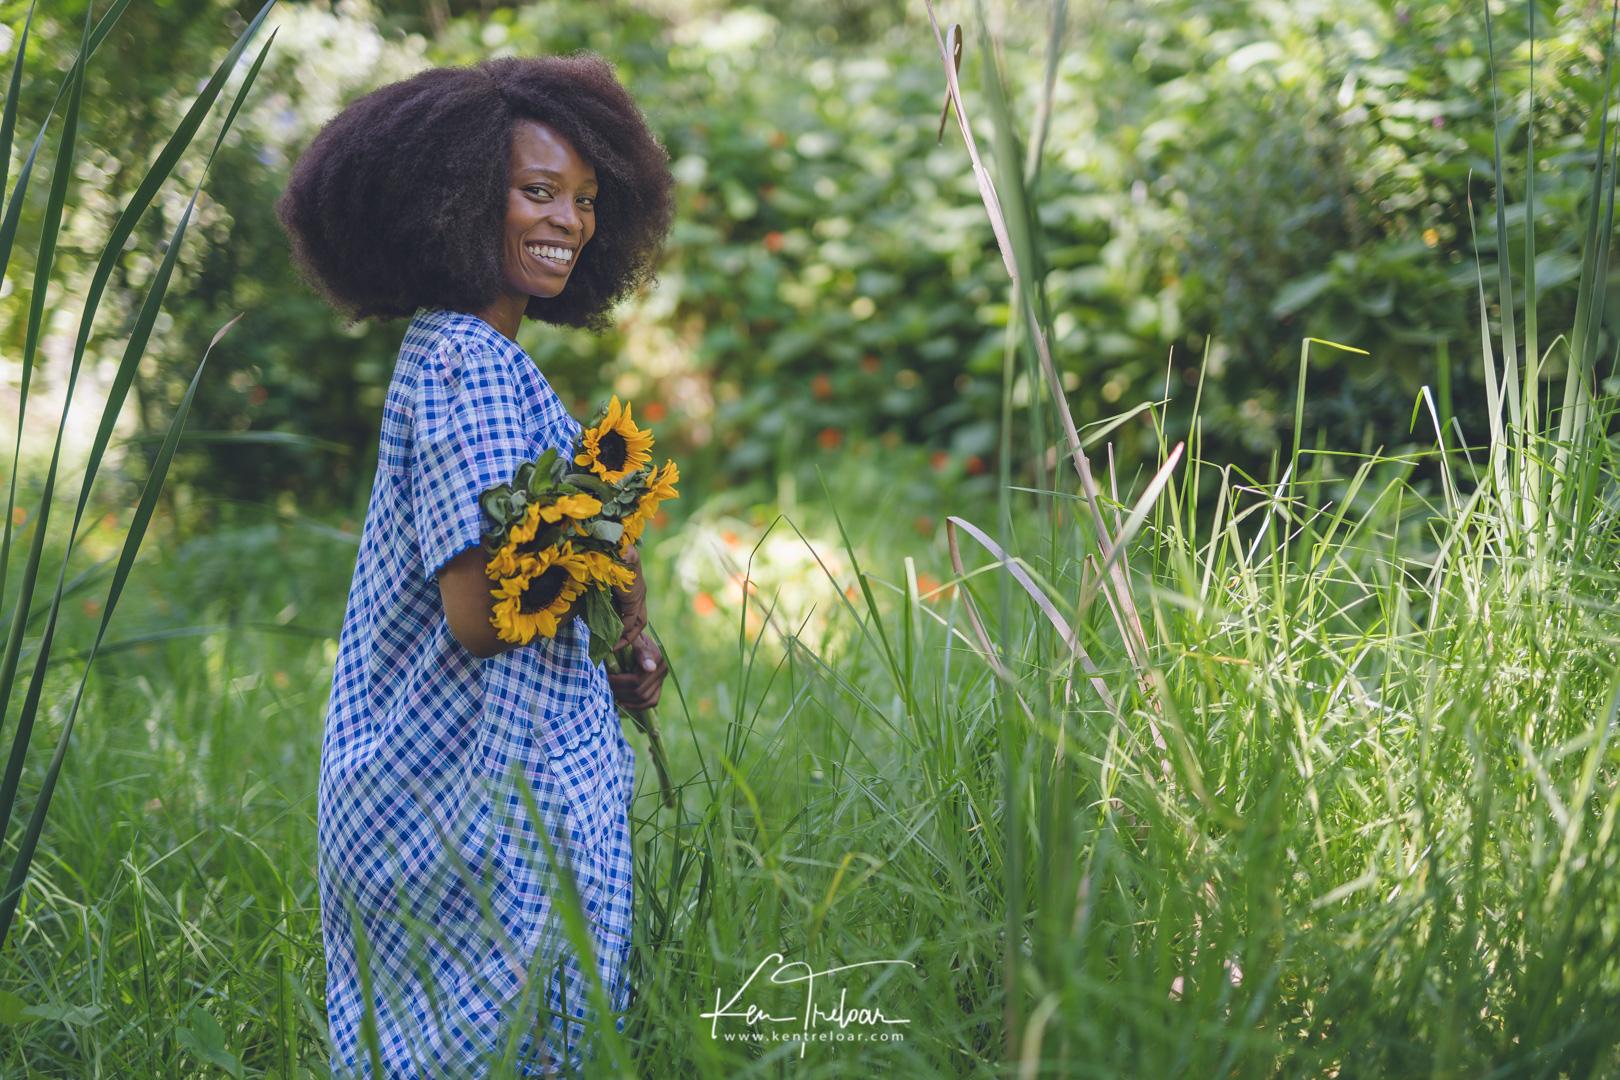 Ken Treloar Photography - Natural L-ight Editorial Portrait Fashion Photo Session - Cape Town Dec 2018-31.jpg